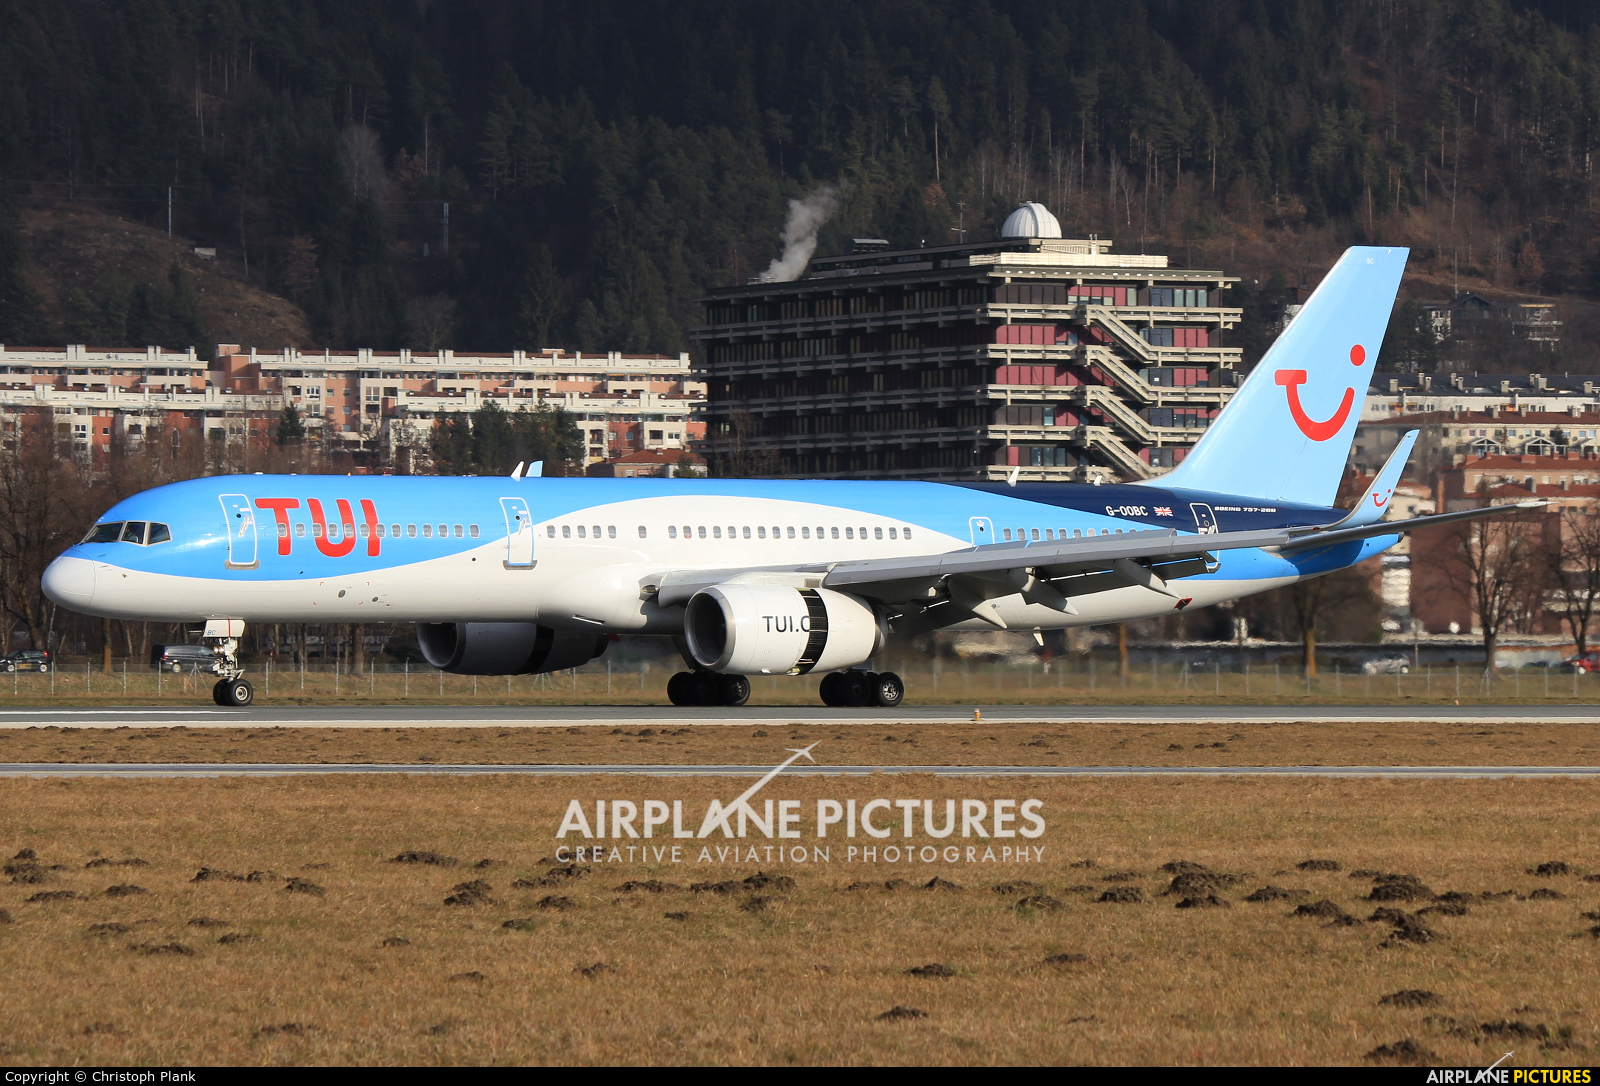 TUI Airways G-OOBC aircraft at Innsbruck